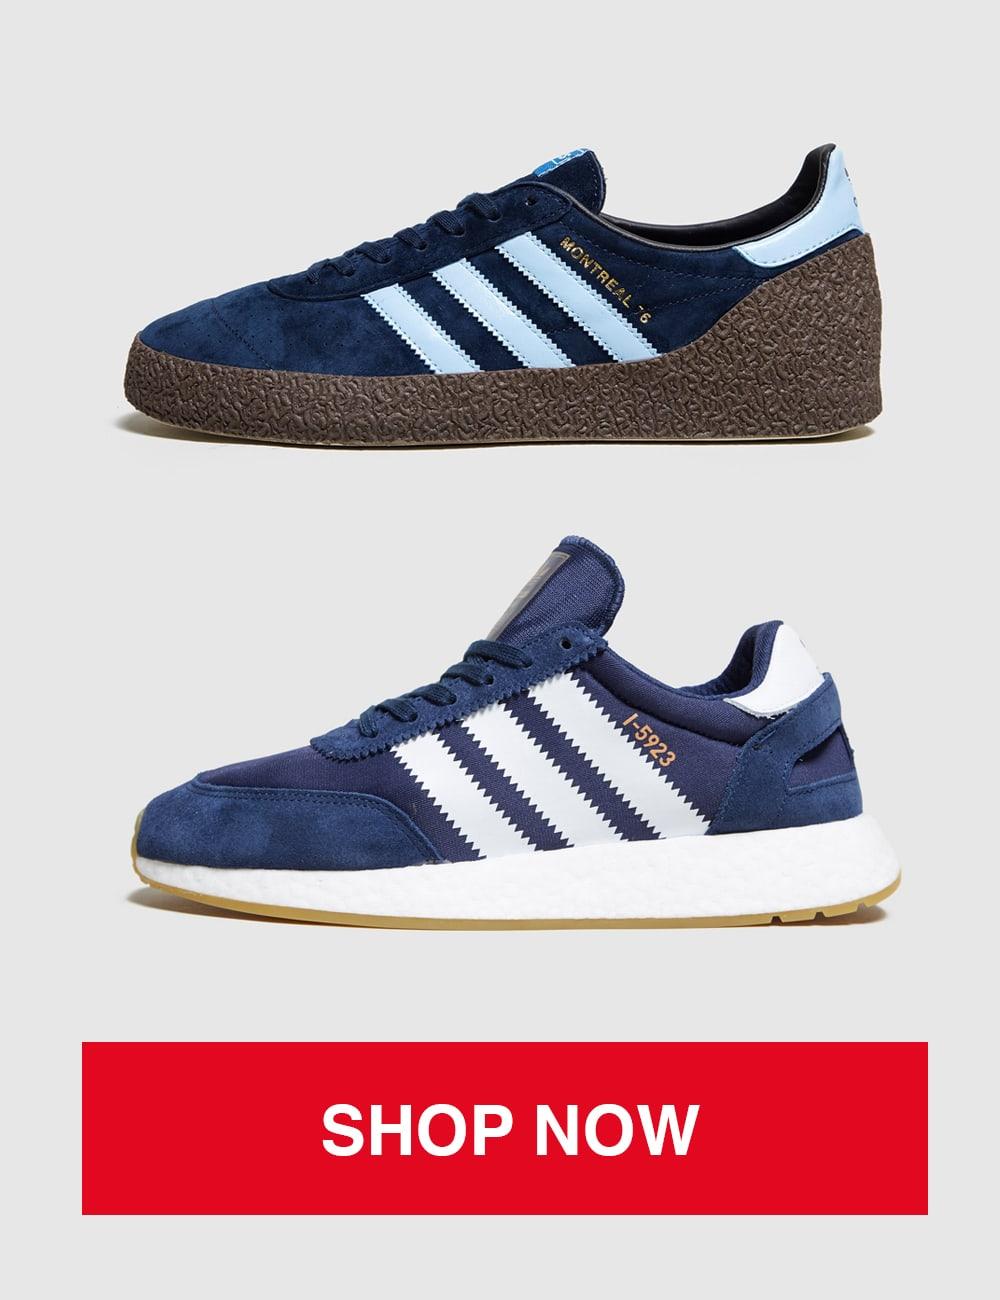 jordan 23 google office. All Brands Adidas Originals Nike Stüssy Converse Carhartt WIP Jordan New Balance Reebok Vans 23 Google Office C